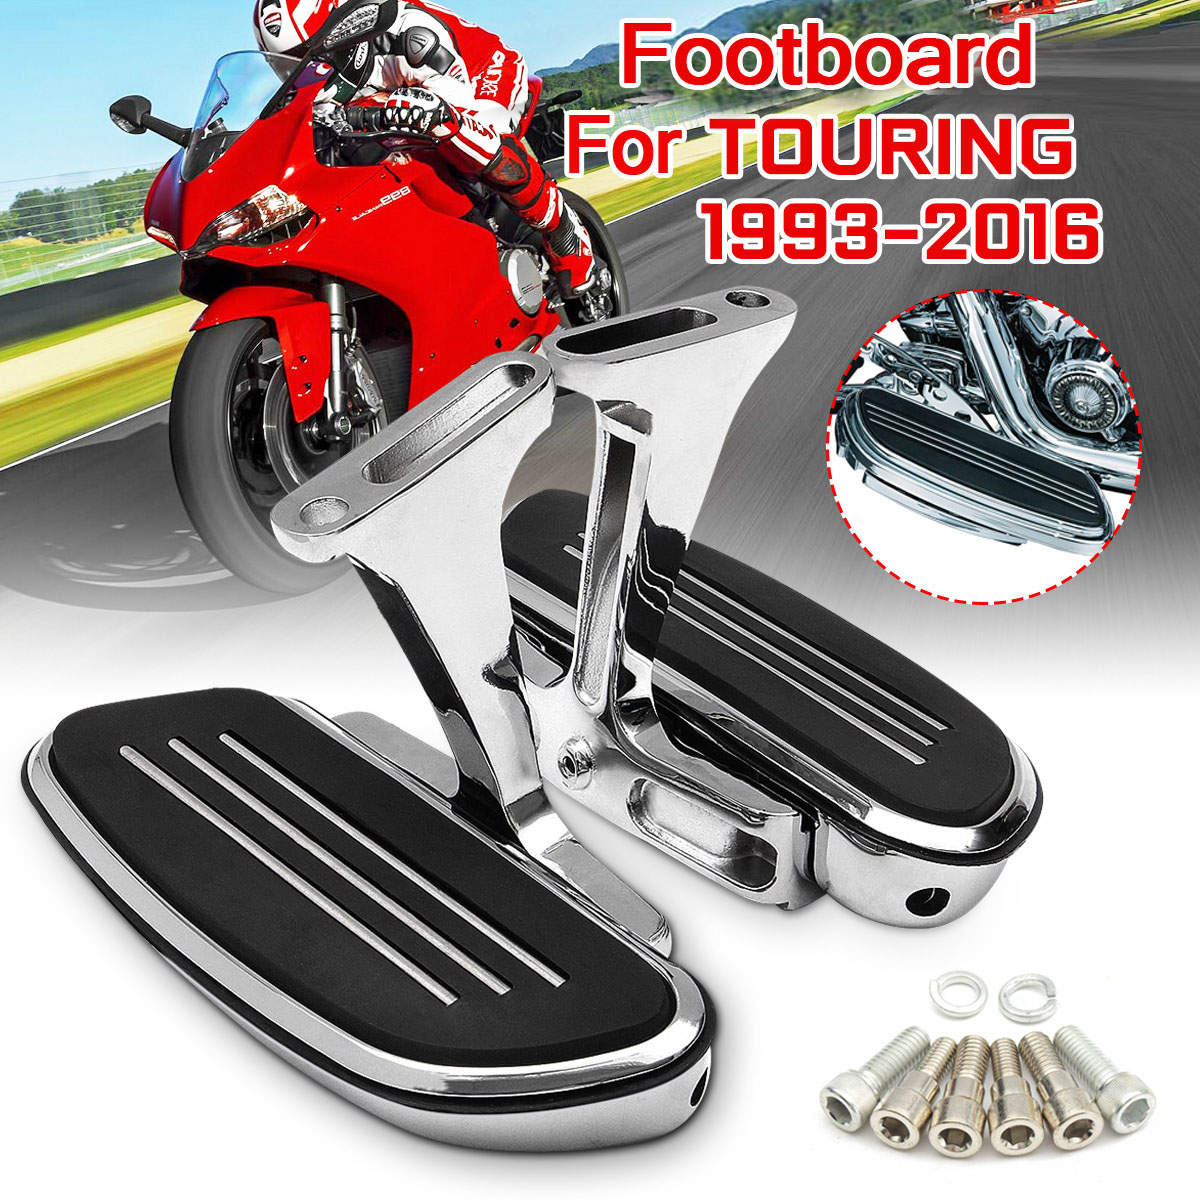 Passenger Foot Pegs Footrest Mount Bracket For Harley Touring Road King 1993-Up